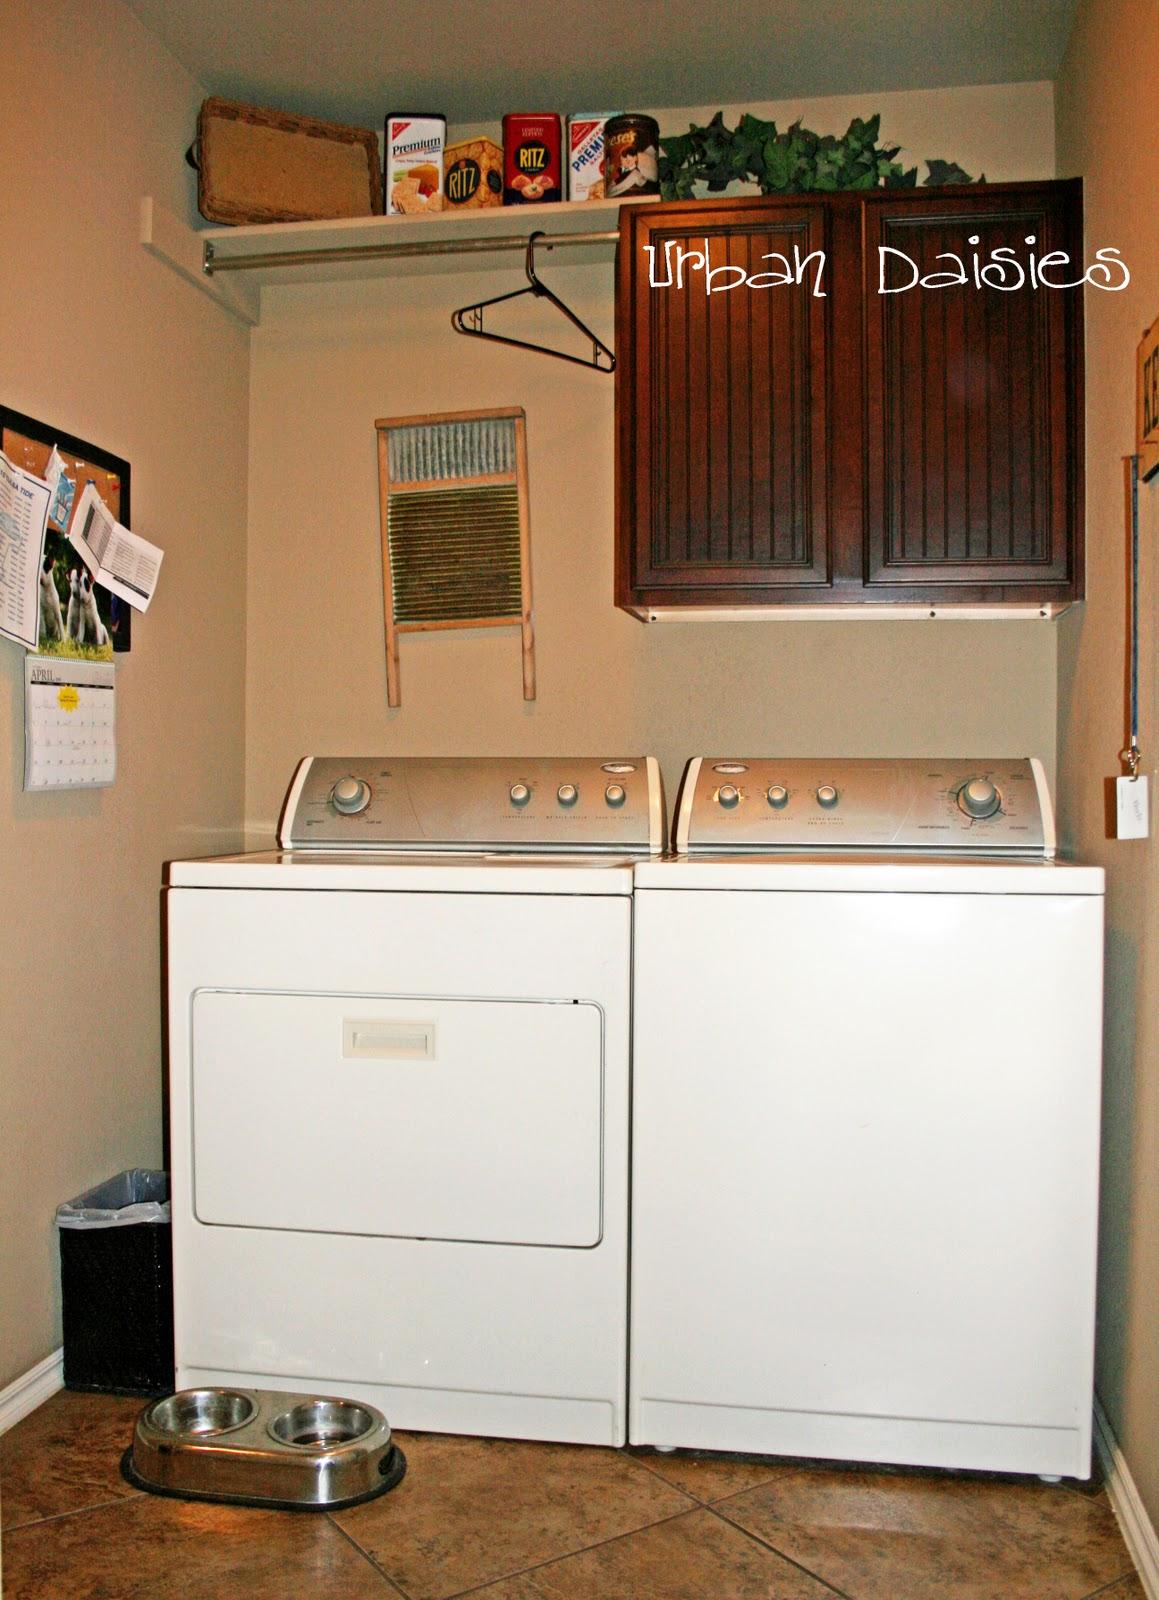 Urban Daisies Laundry Room Redo